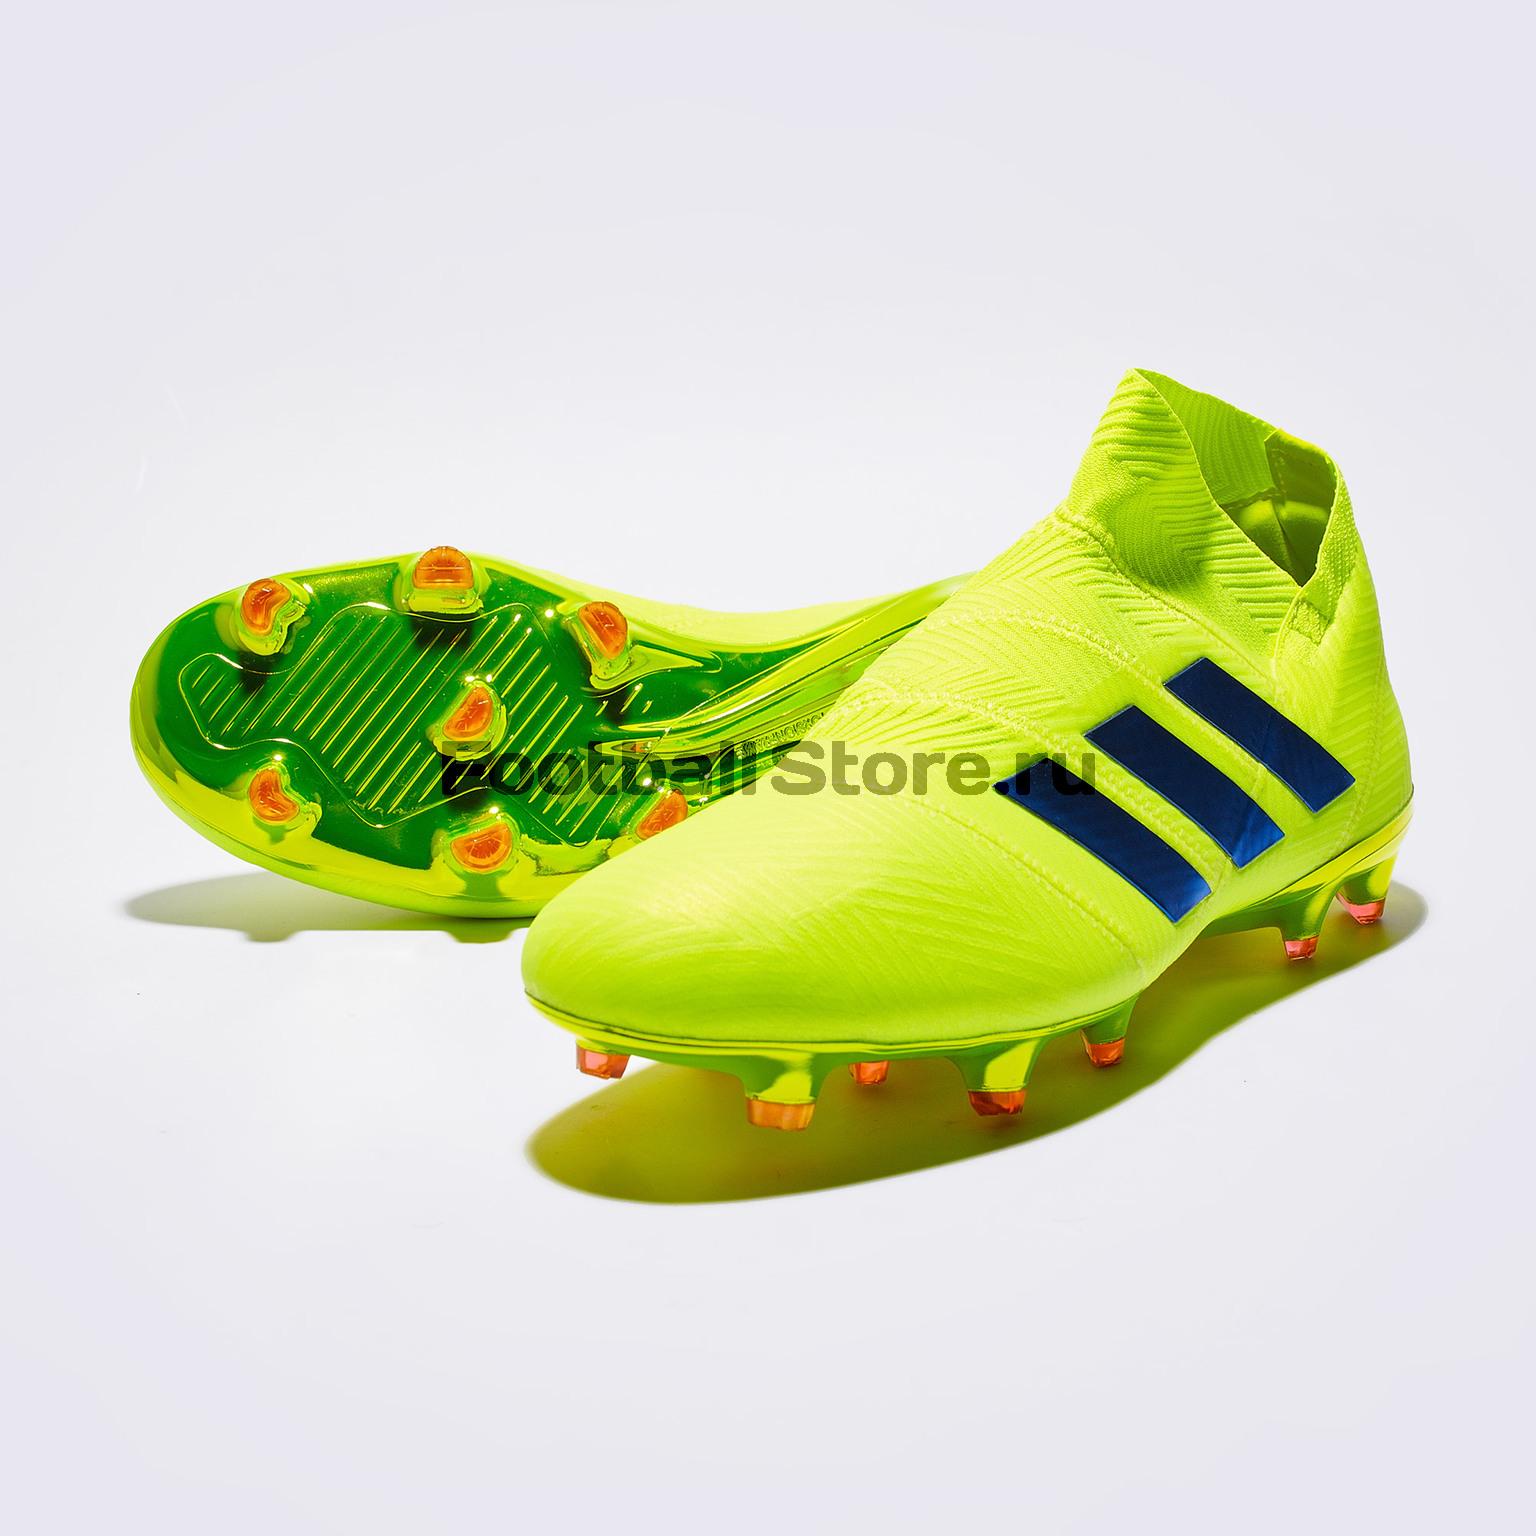 2f2c683e Бутсы Adidas Nemeziz 18 + FG BB9420